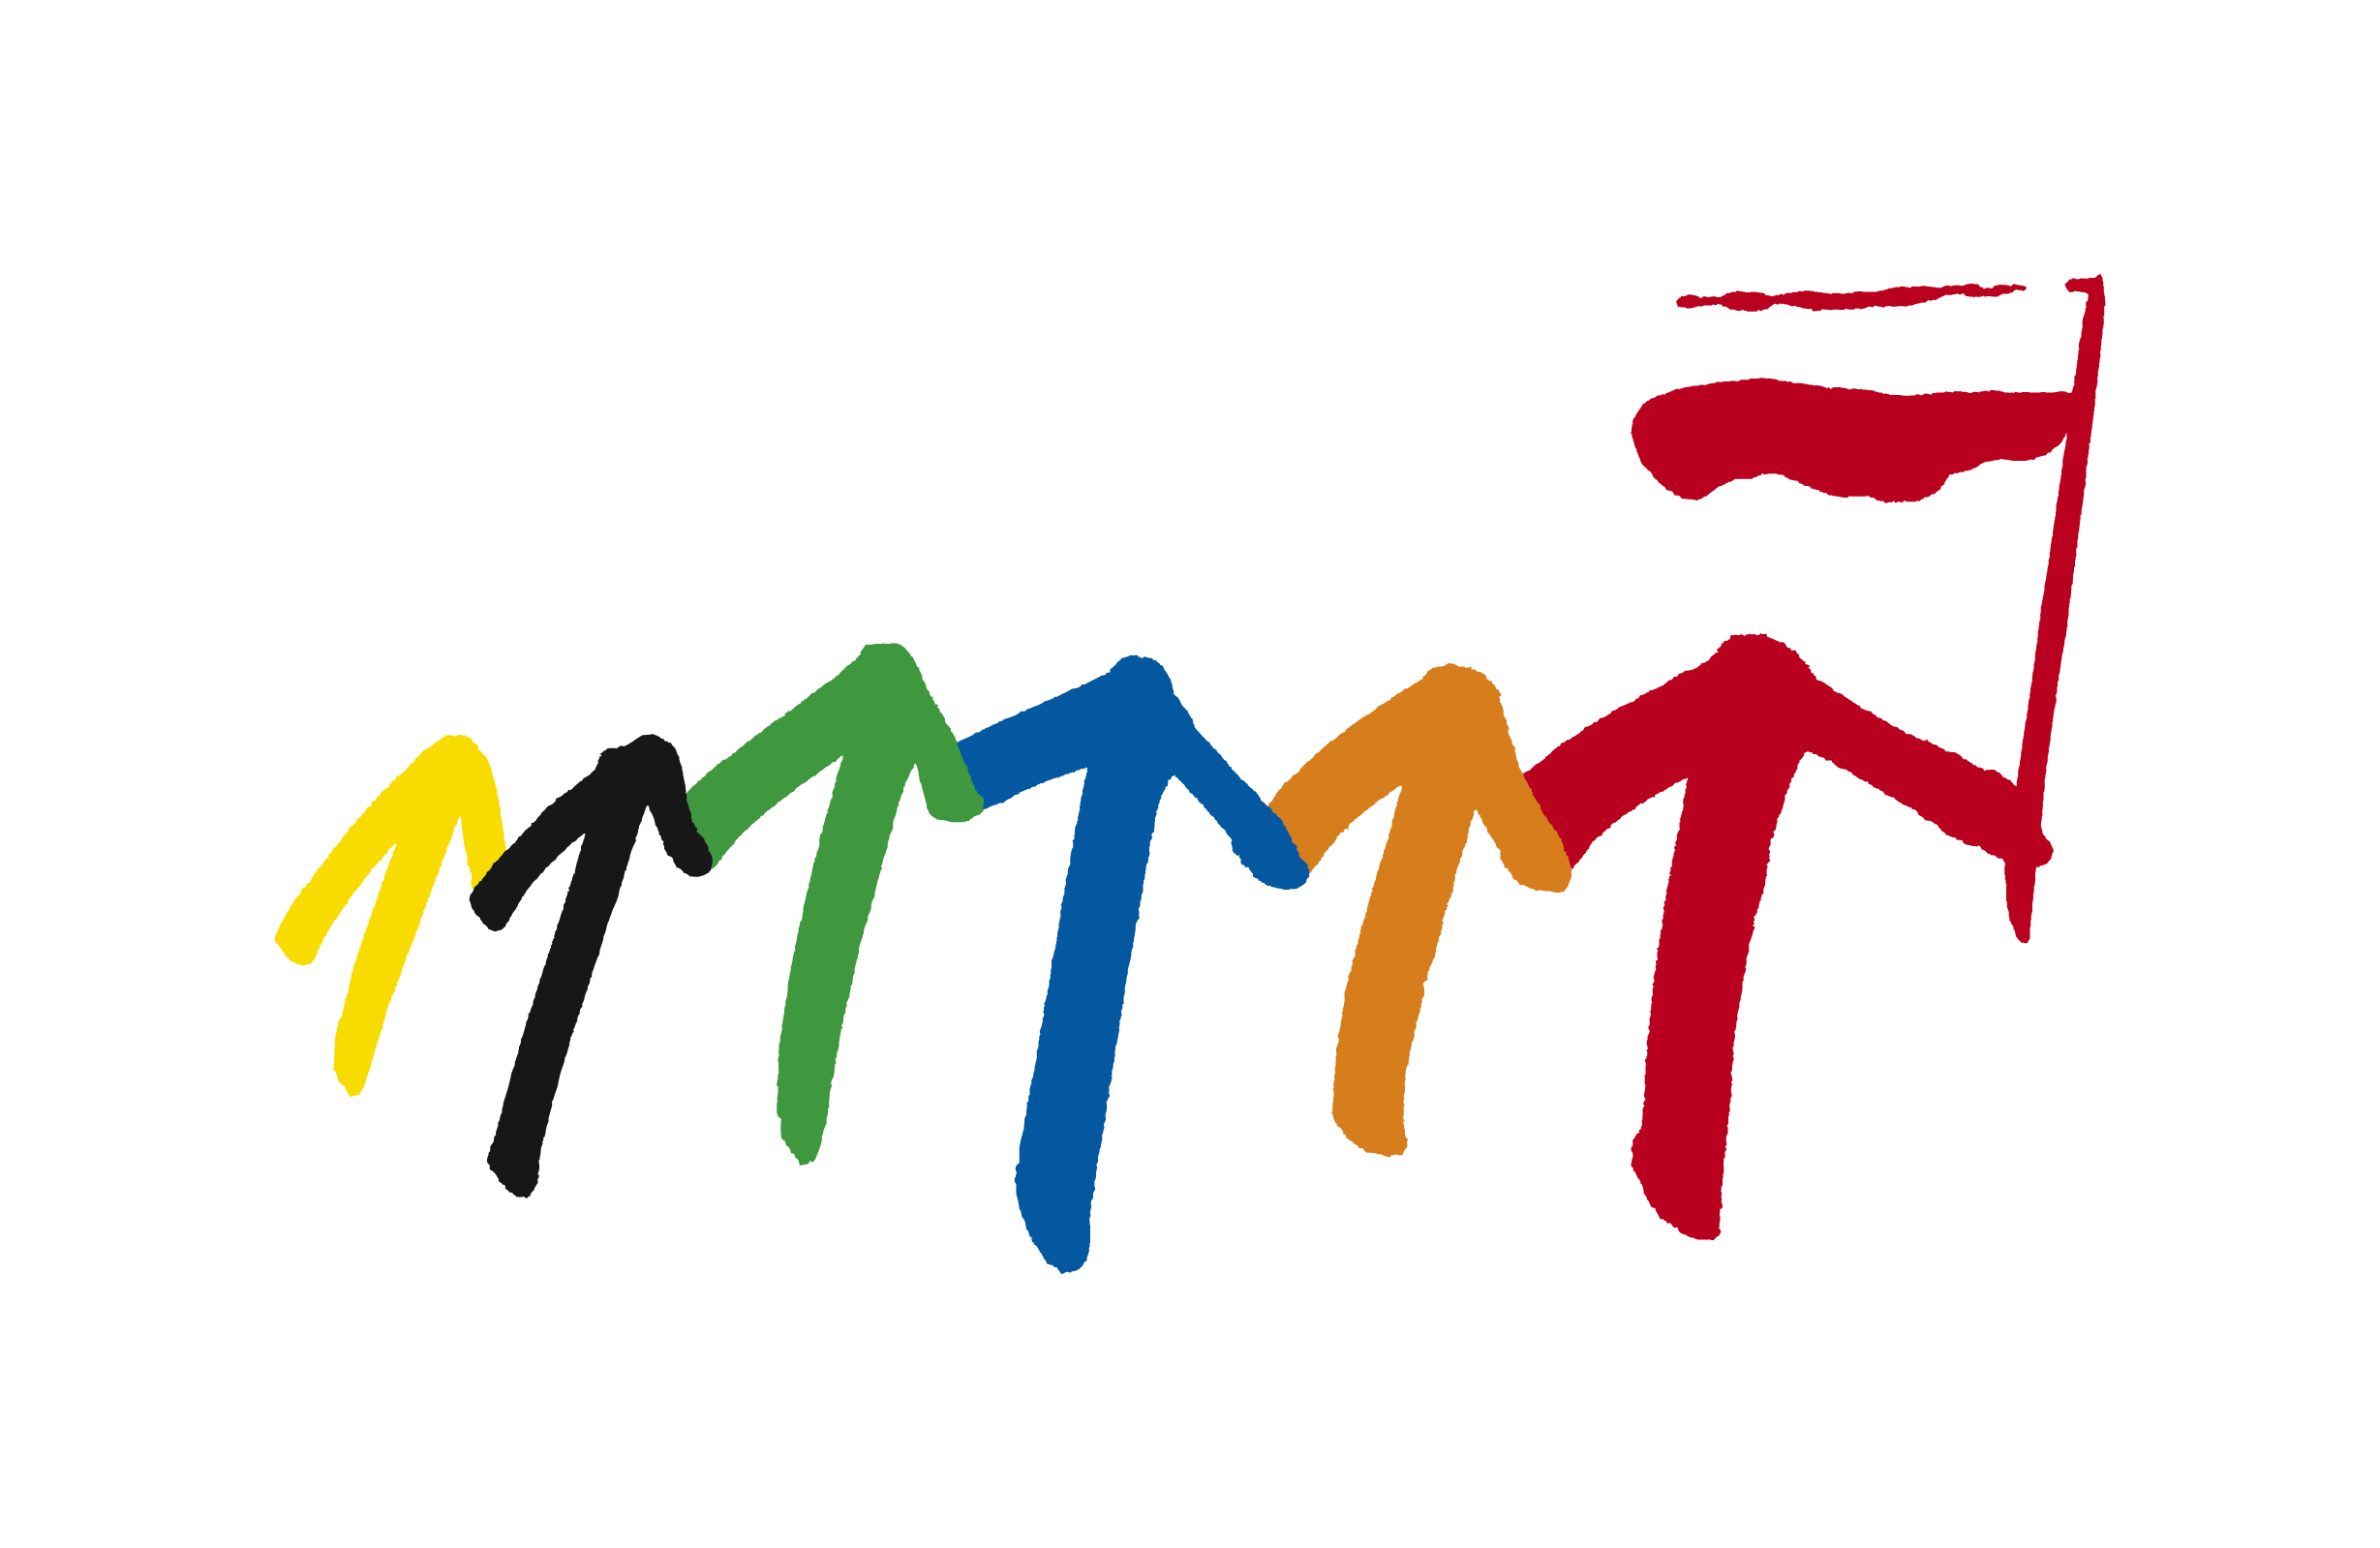 logo bez napisu kolor